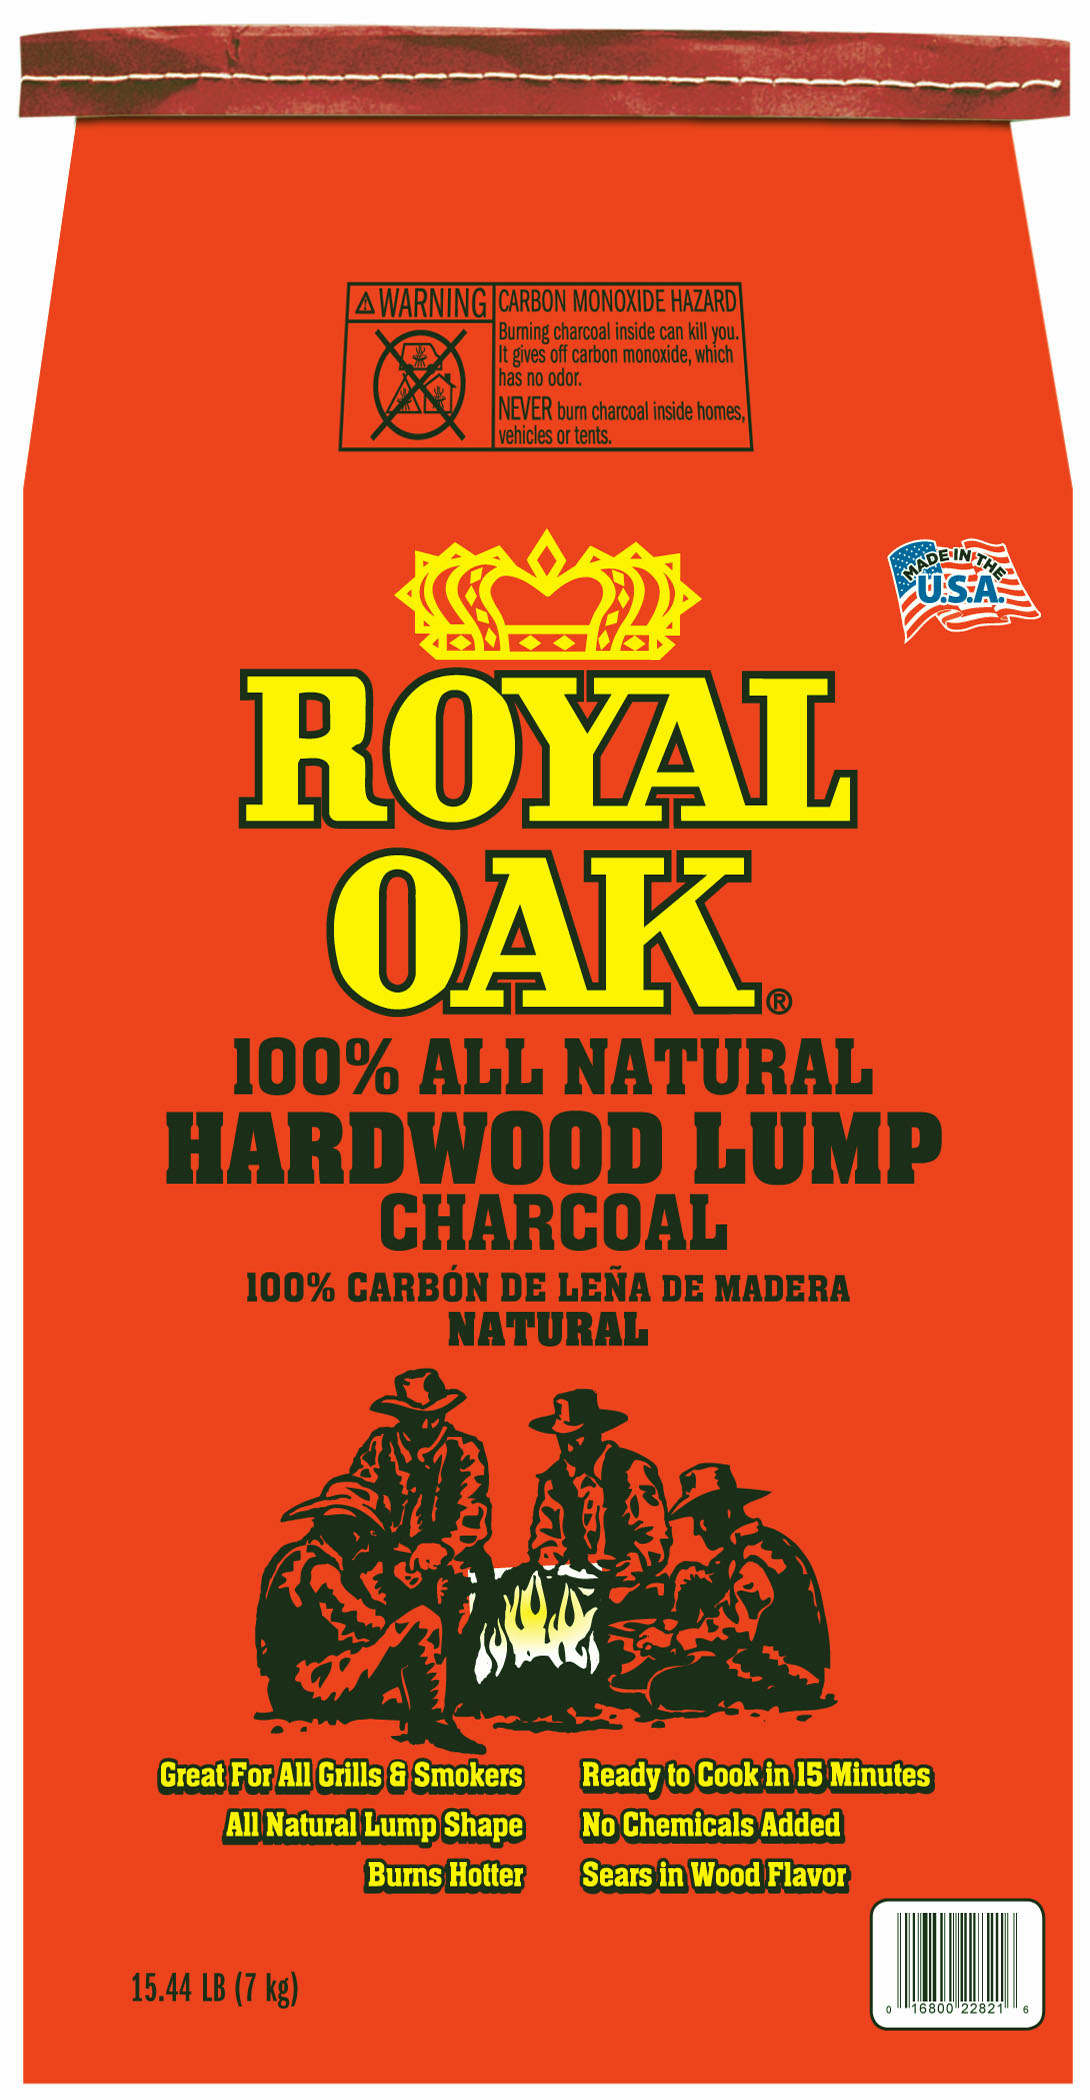 Royal Oak All Natural Hardwood Lump Charcoal 1544LB